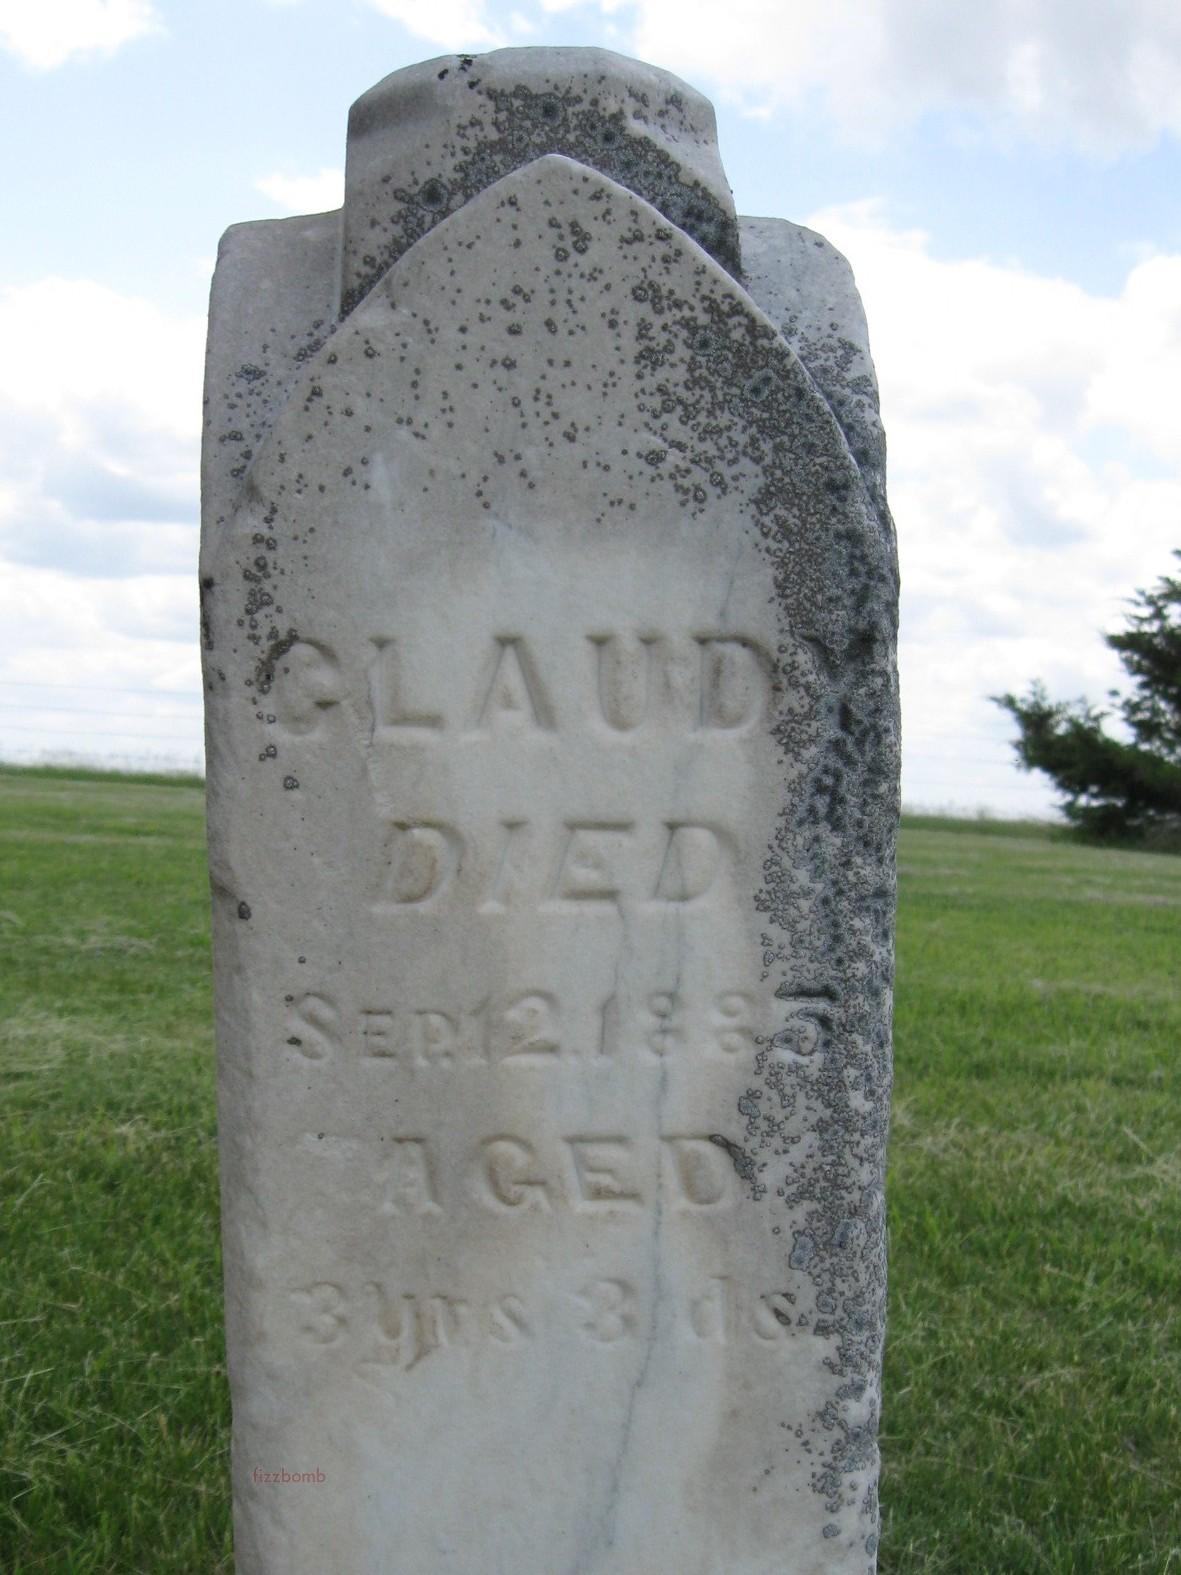 Close up photo of inscription